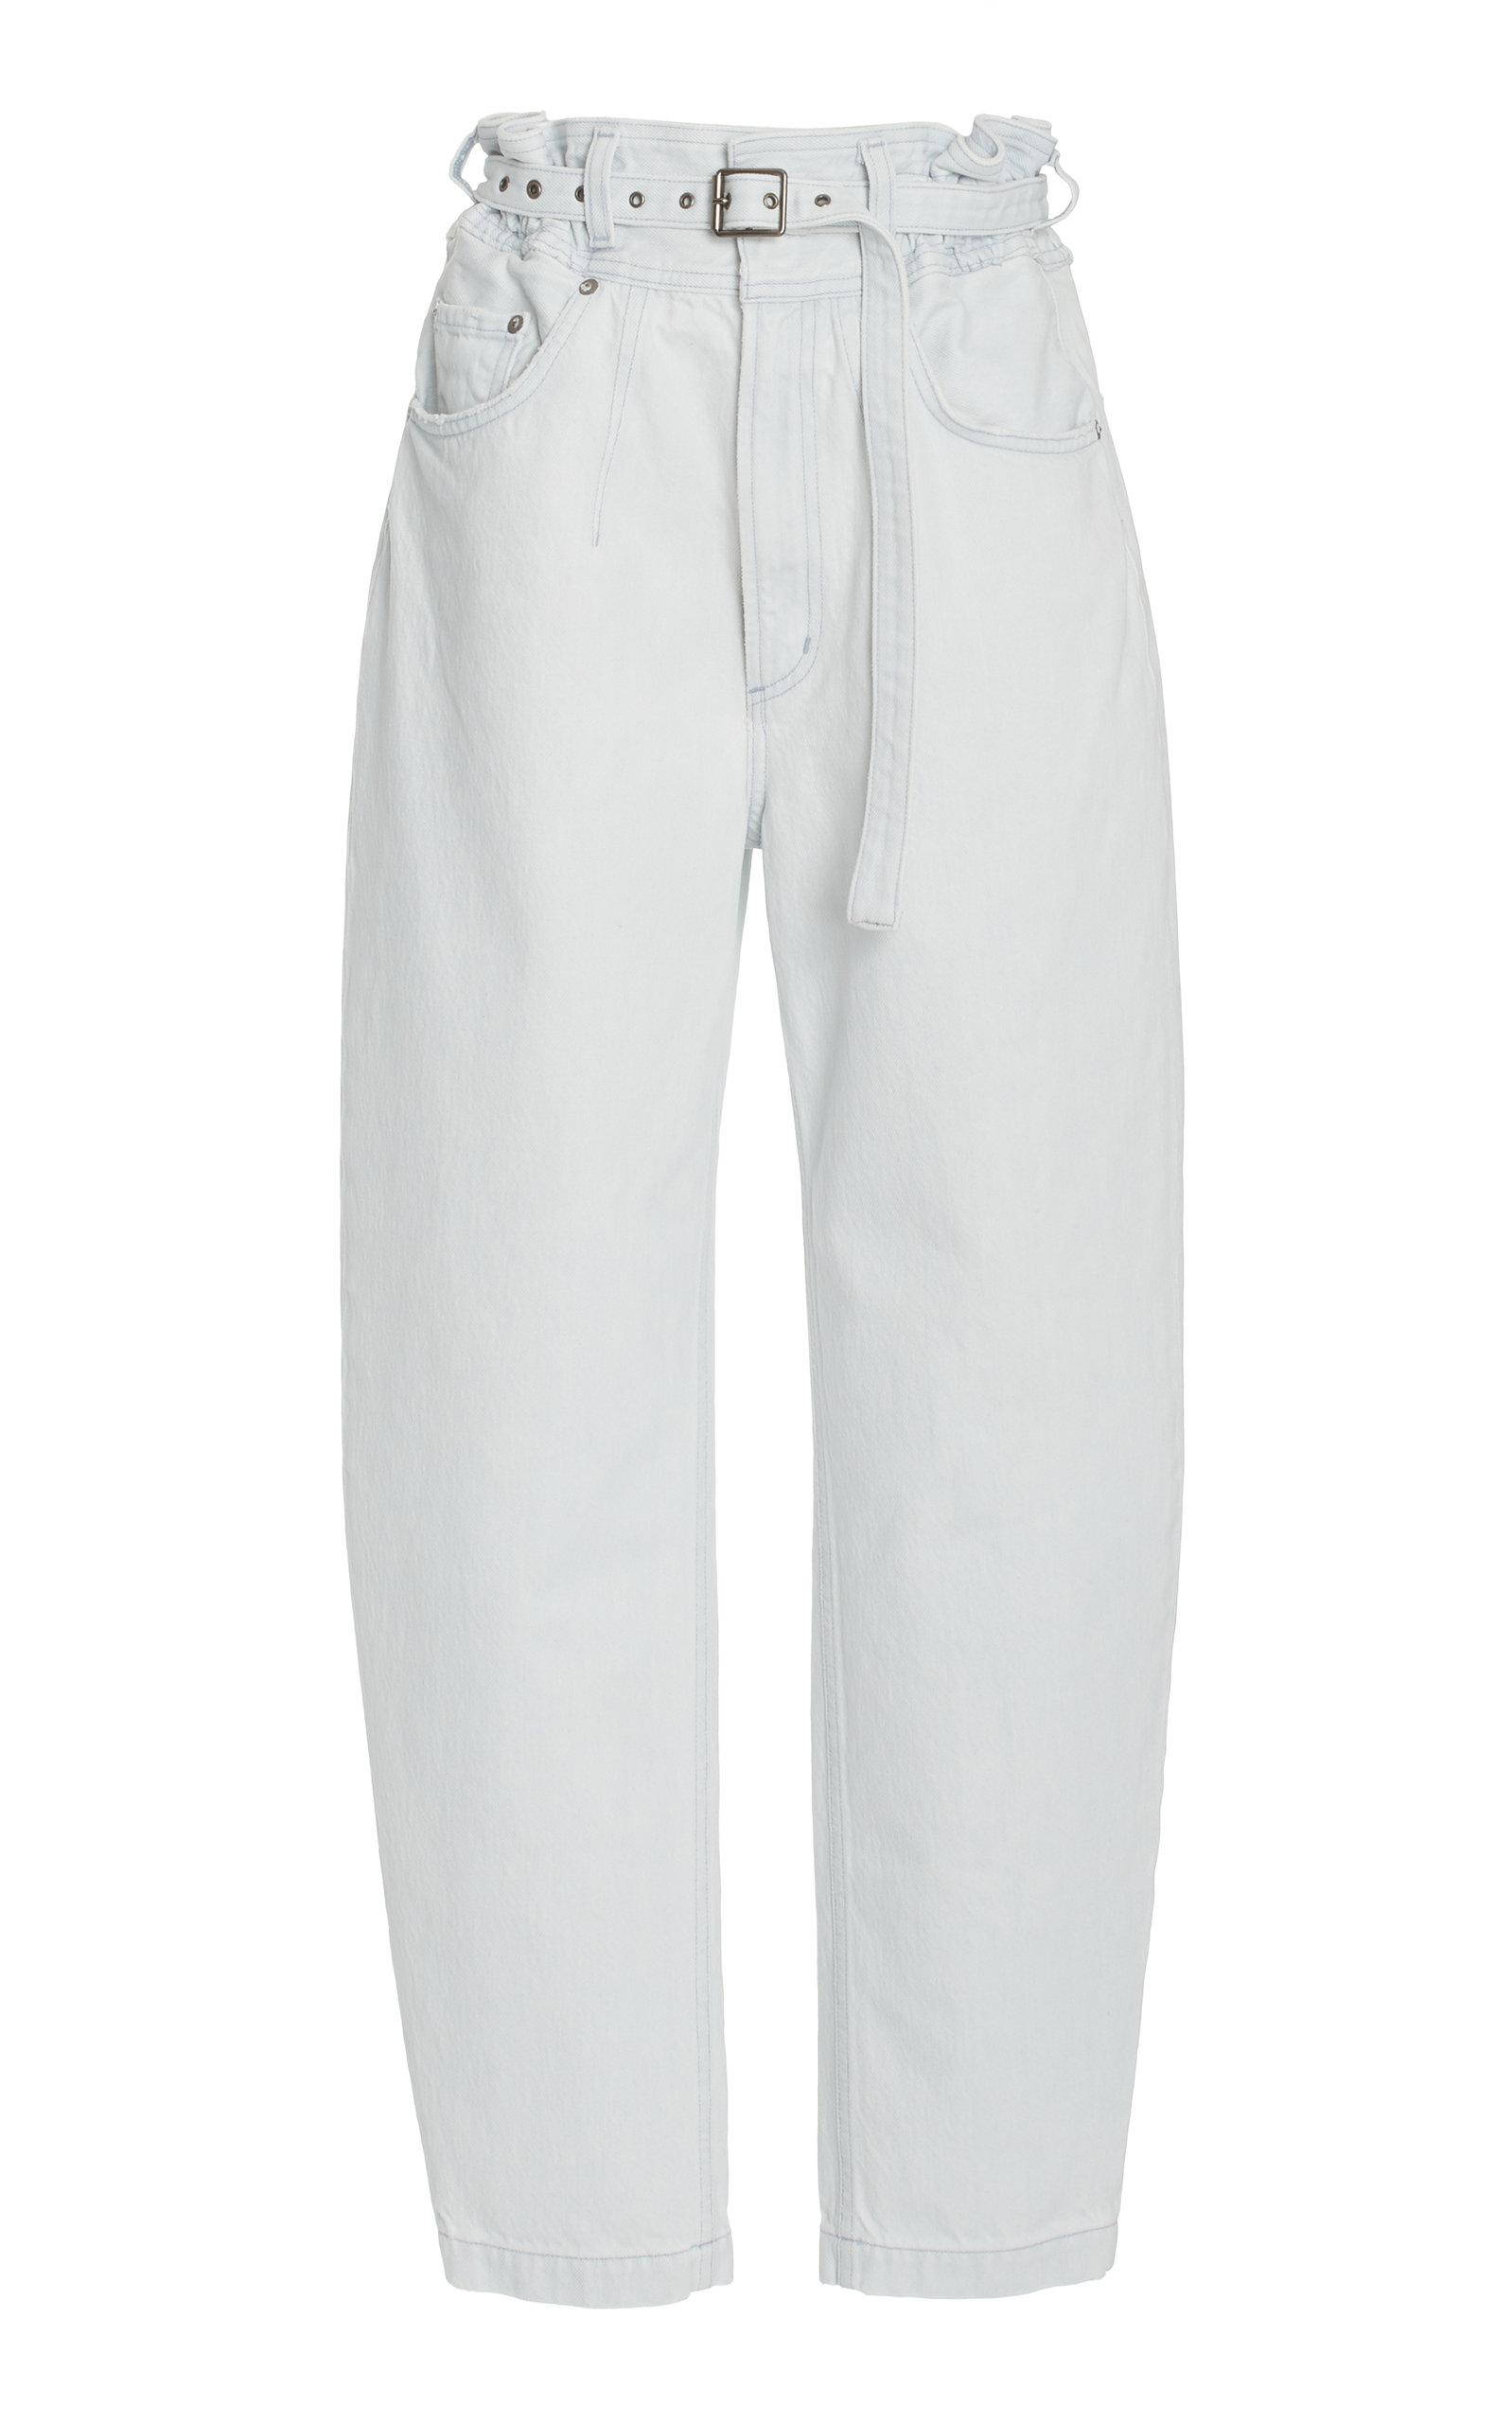 Agolde - Women's Riya Elasticated Peg Rigid Tapered Jeans - Light Wash - Moda Operandi